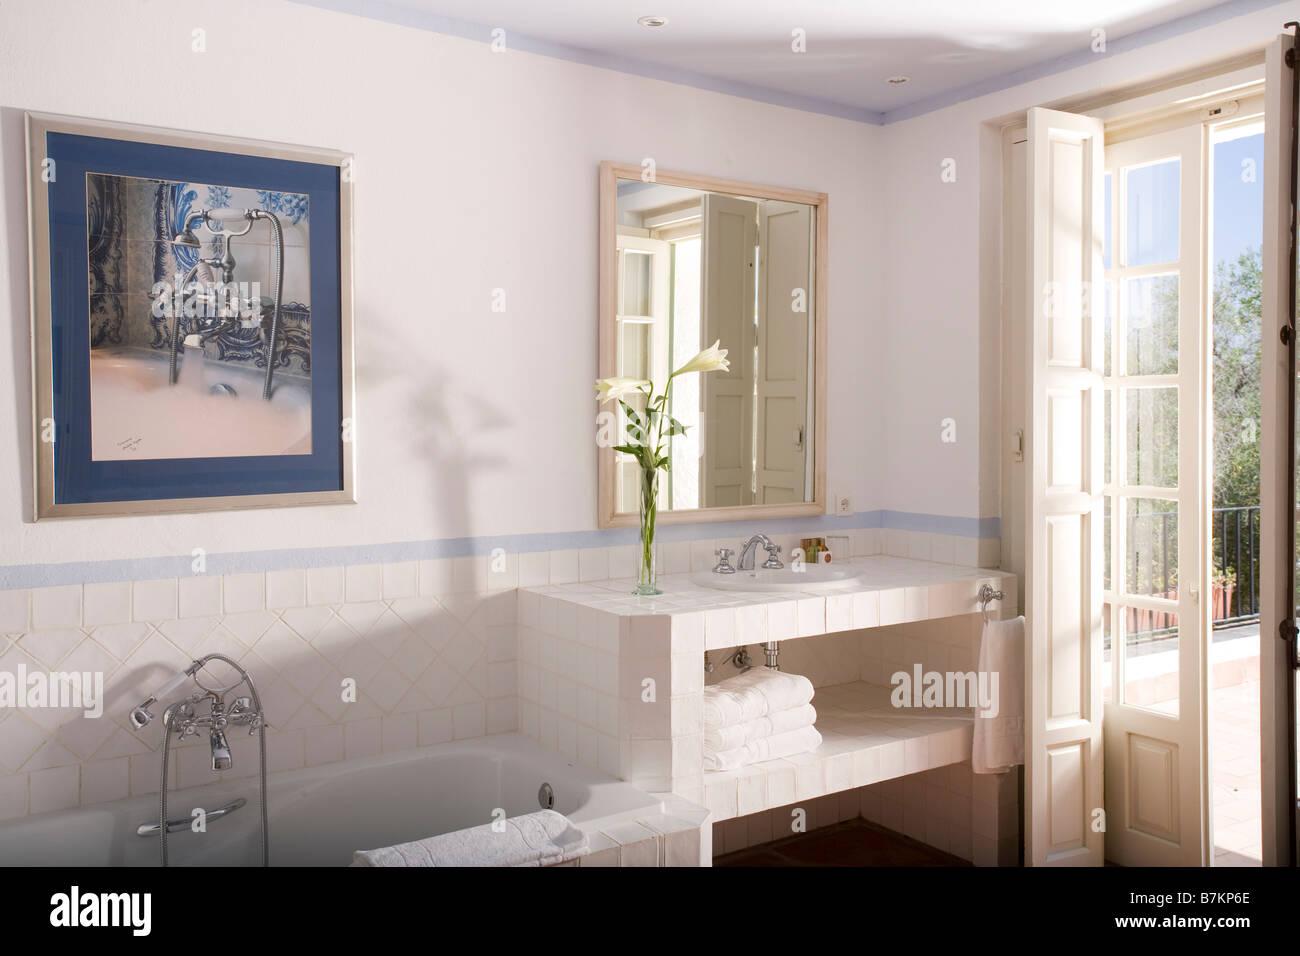 Basin In Simple Vanity Unit Beside French Doors In Modern White Hotel  Bathroom In Arcos De La Frontera In Southern Spain